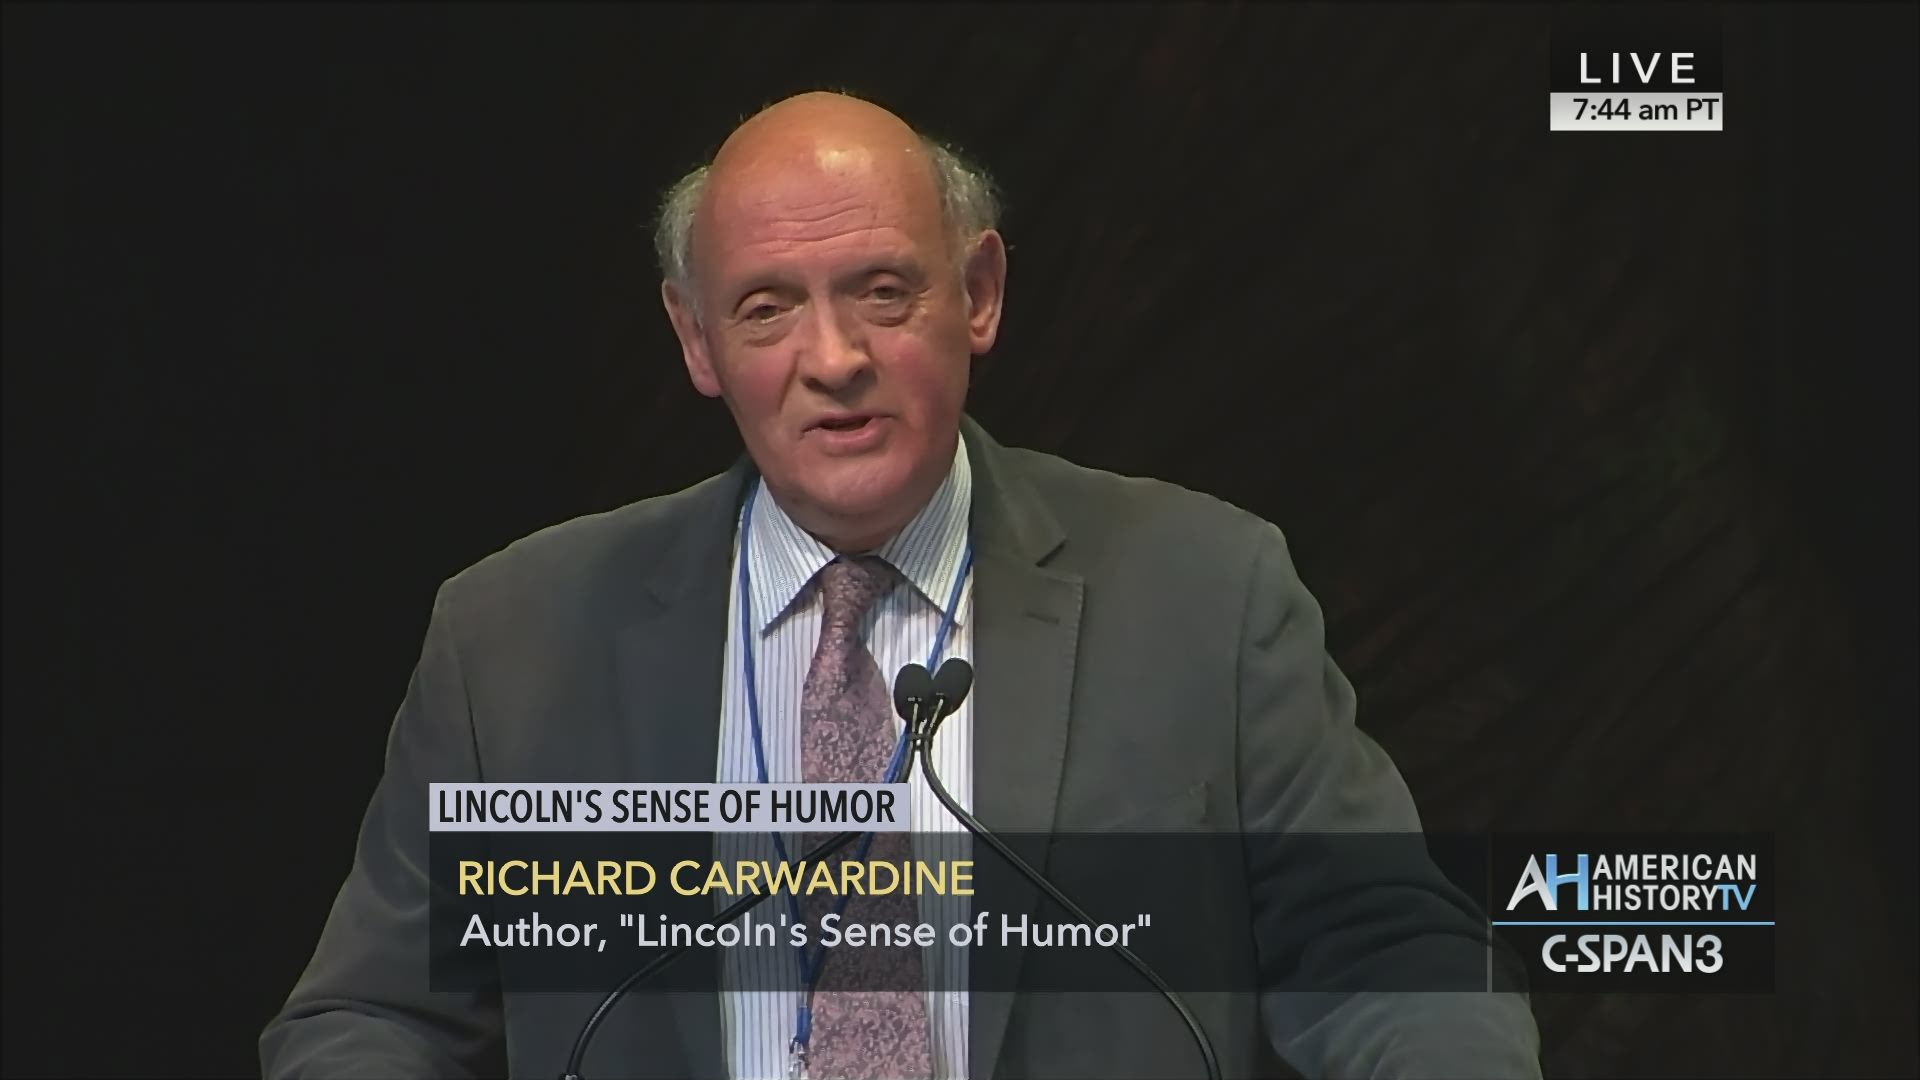 Lincoln S Sense Of Humor C Span Org